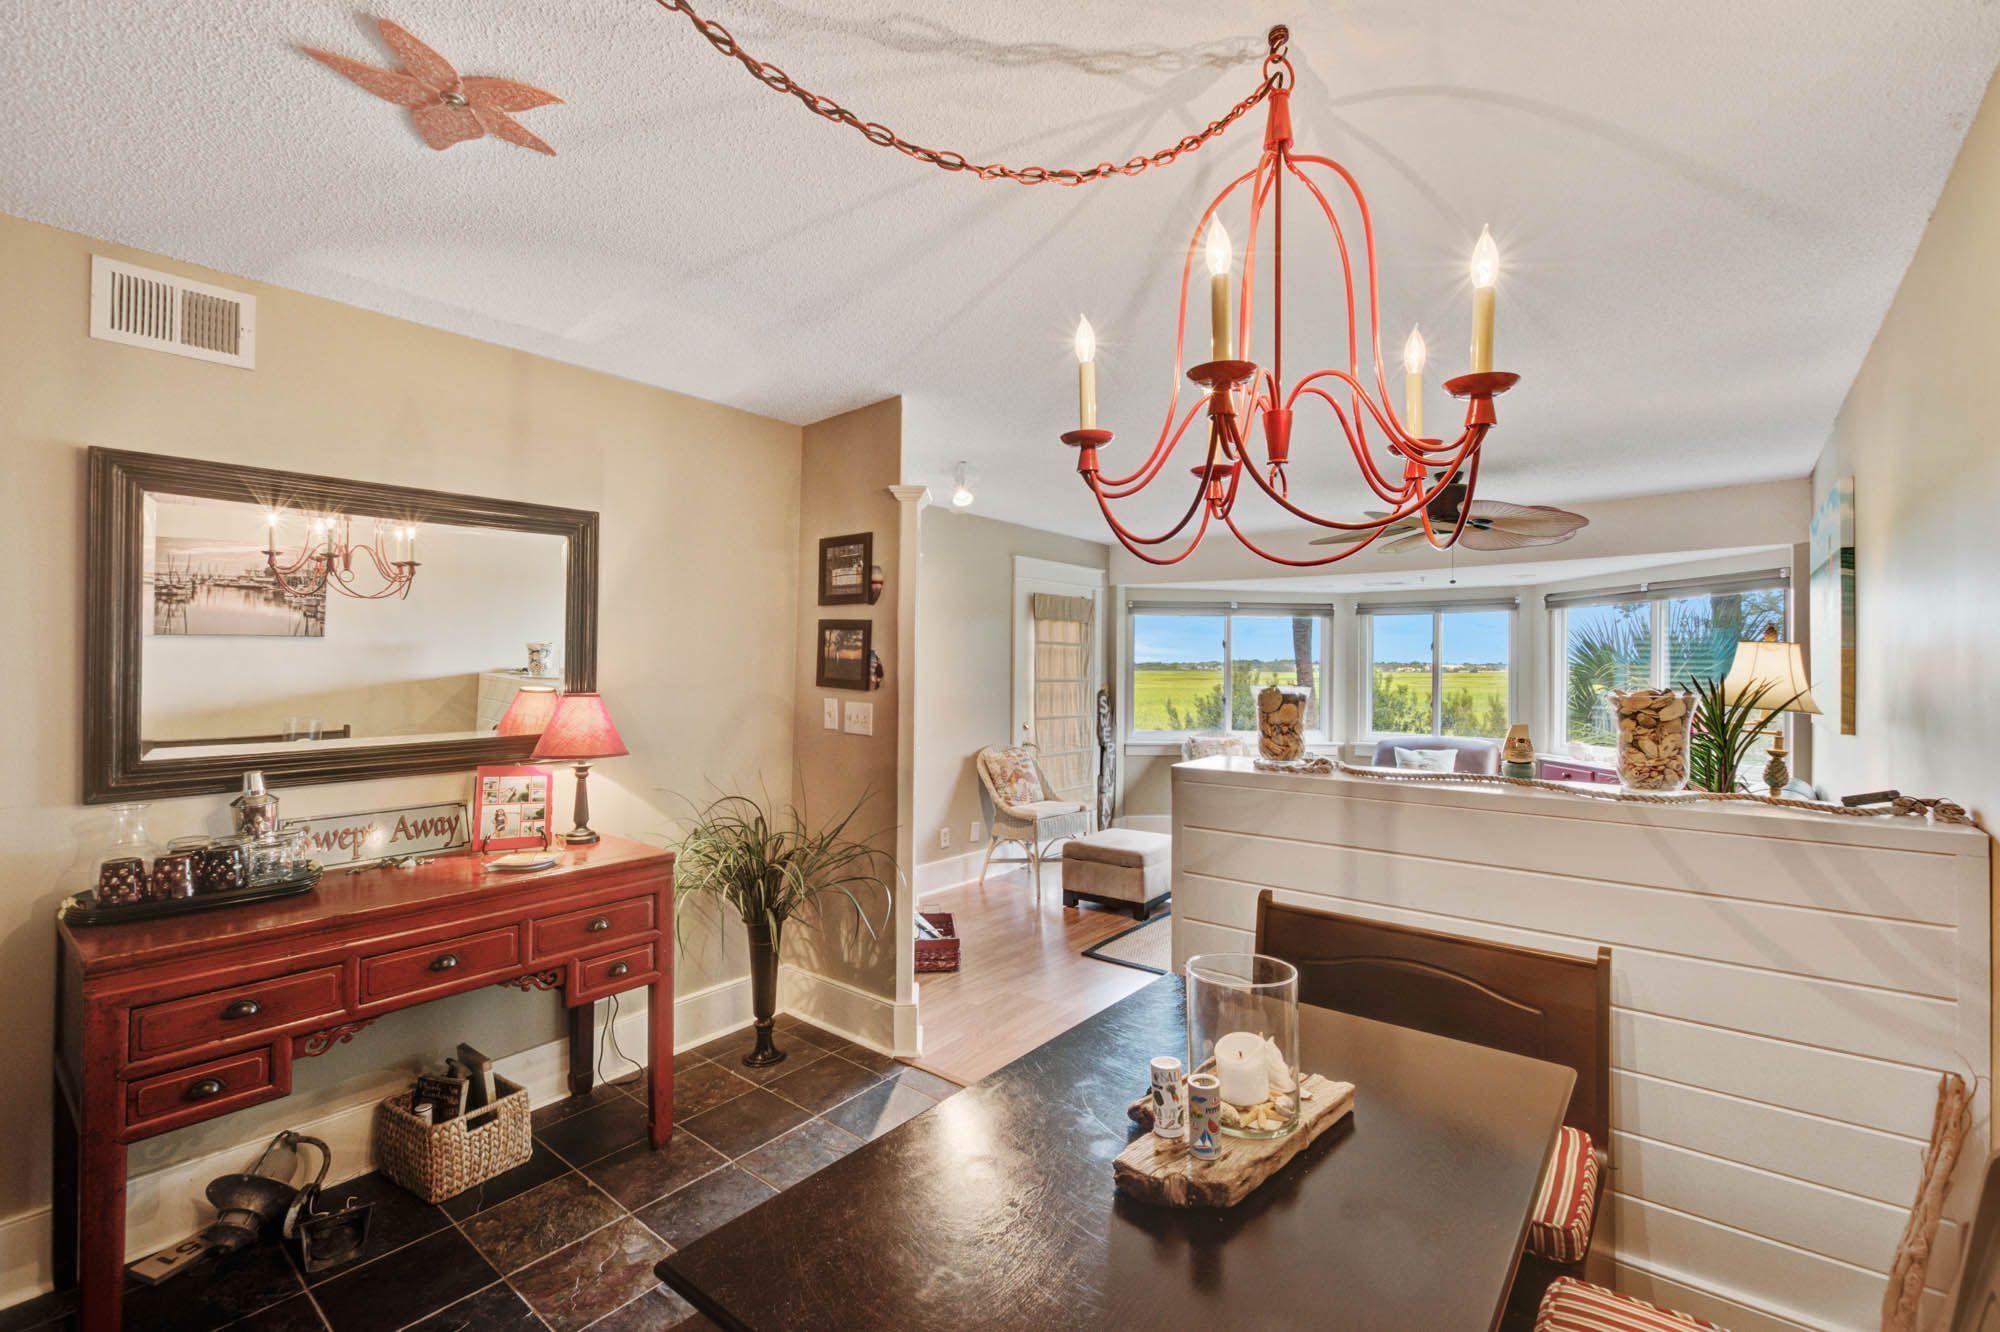 Marshview Villas Homes For Sale - 151 Marsh View Villas, Folly Beach, SC - 9